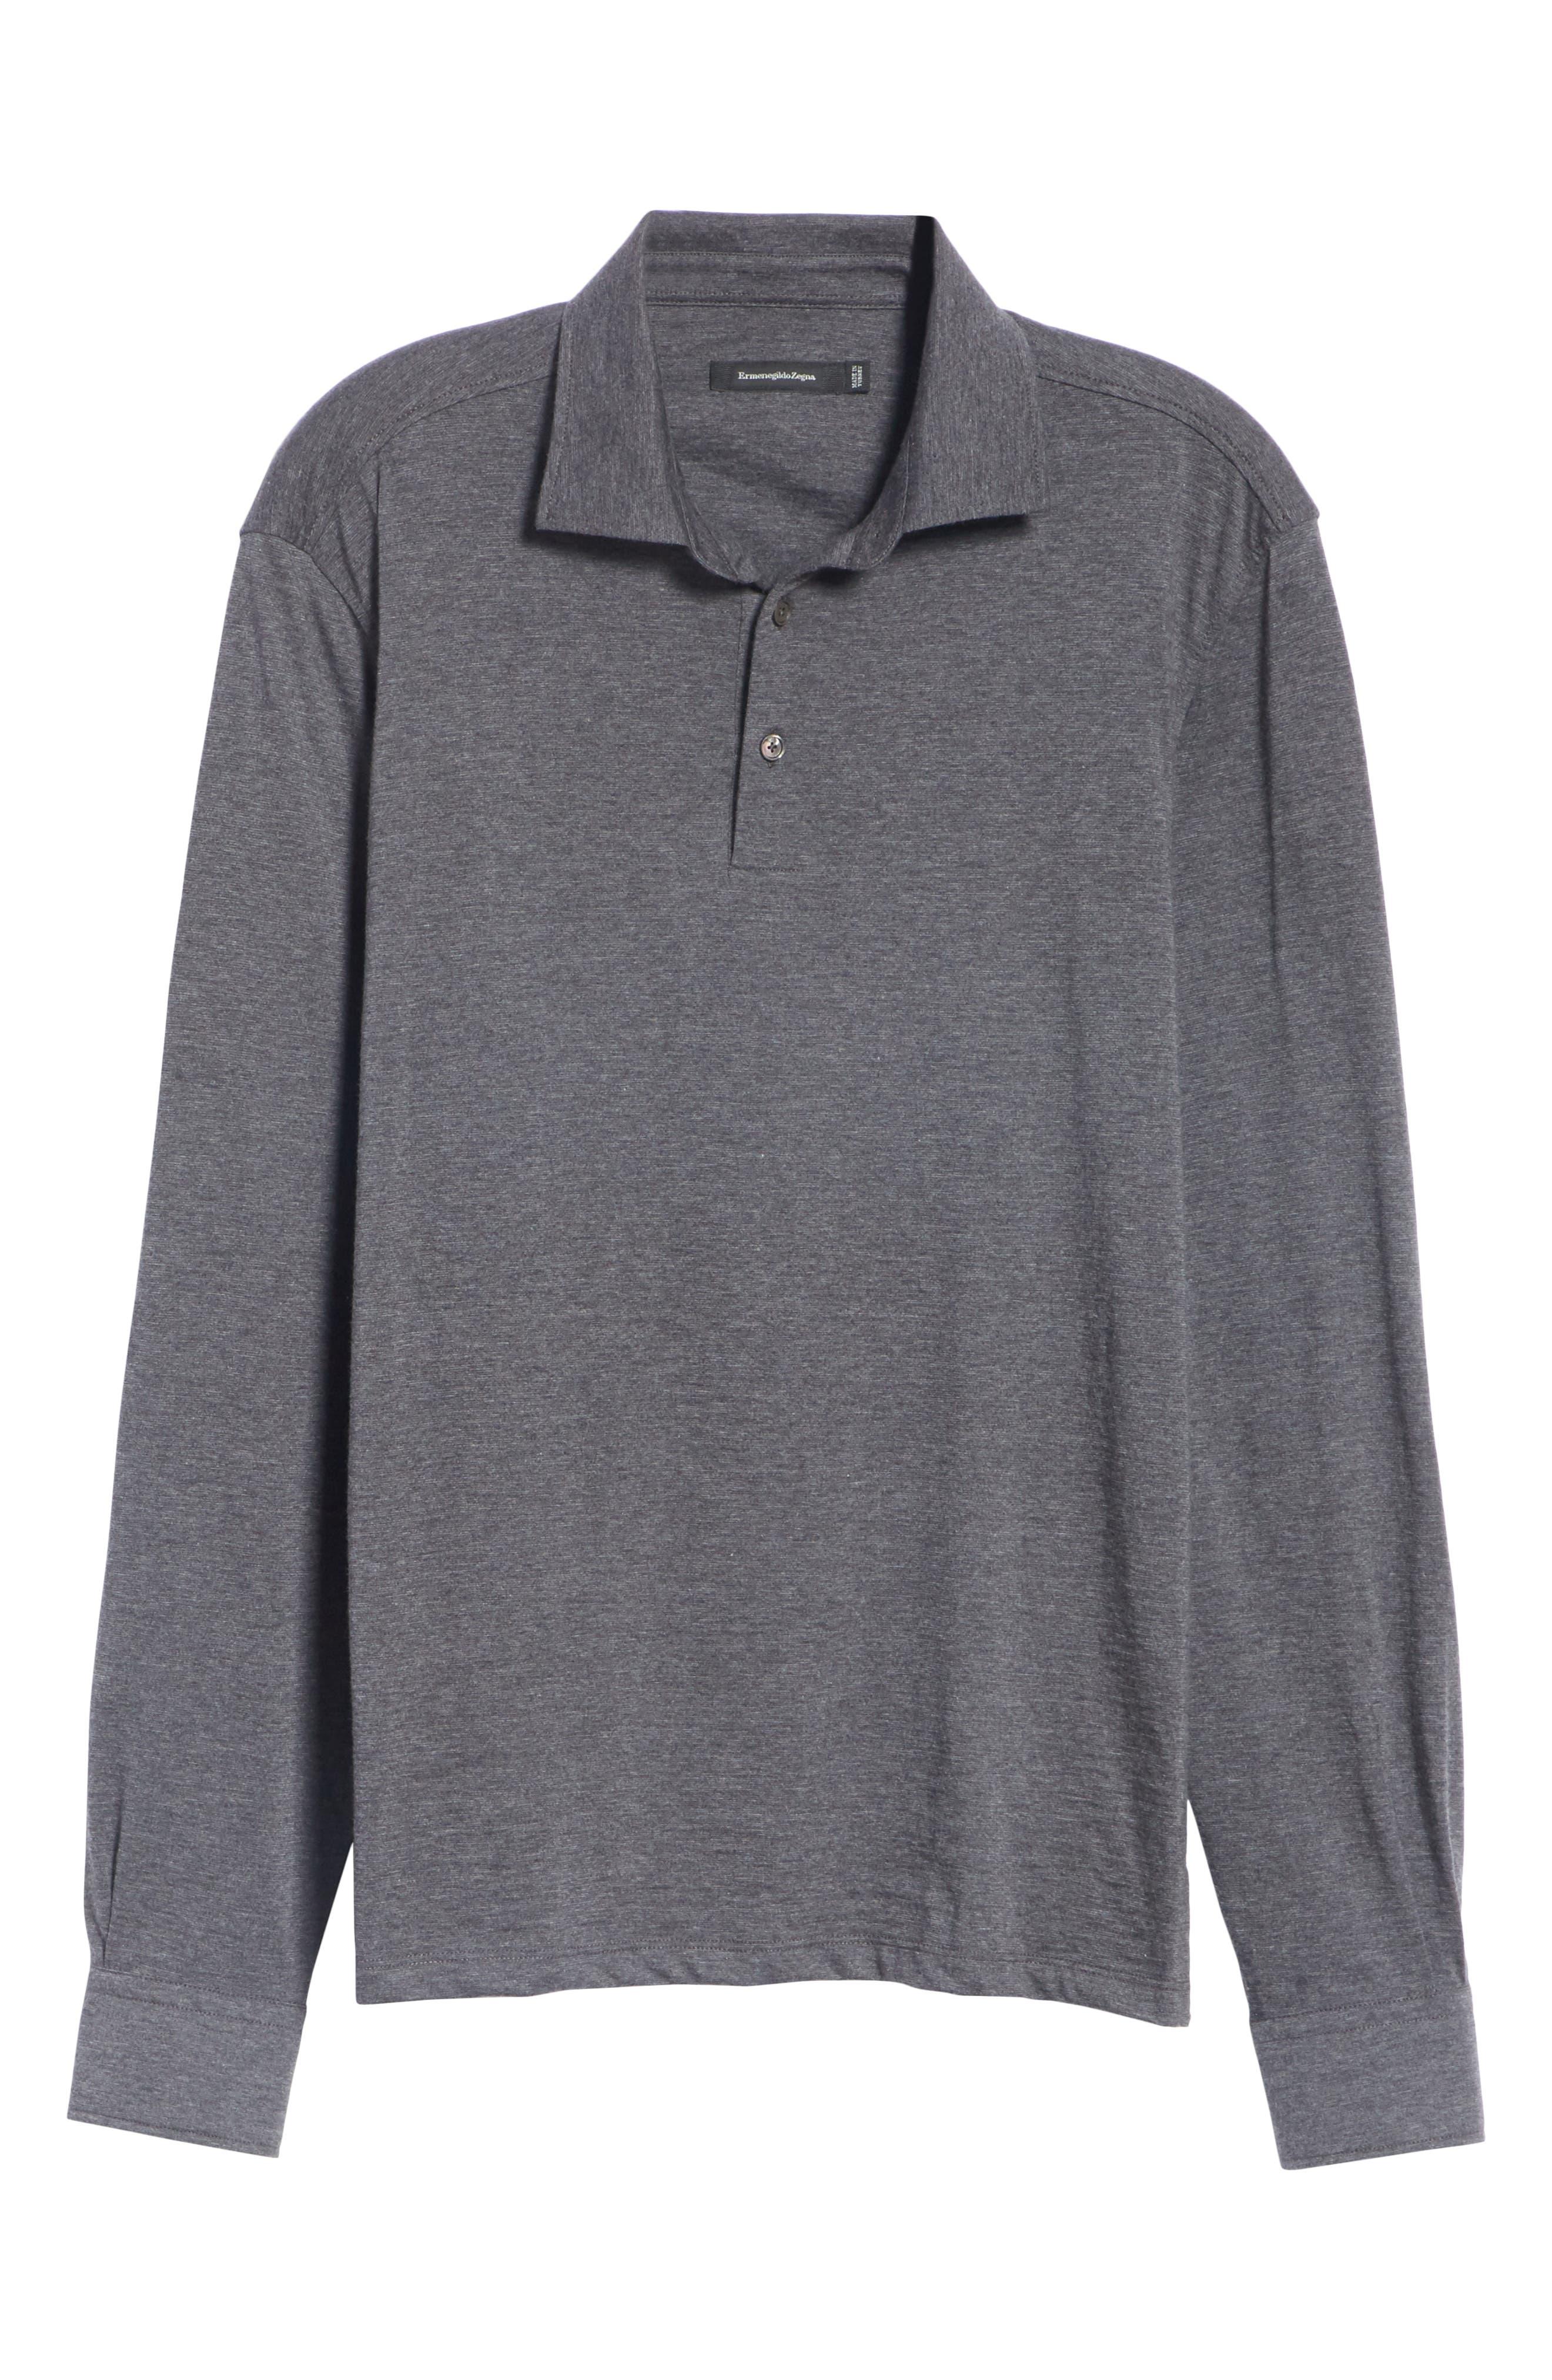 Wool & Cotton Long Sleeve Polo Shirt,                             Alternate thumbnail 6, color,                             CHARCOAL